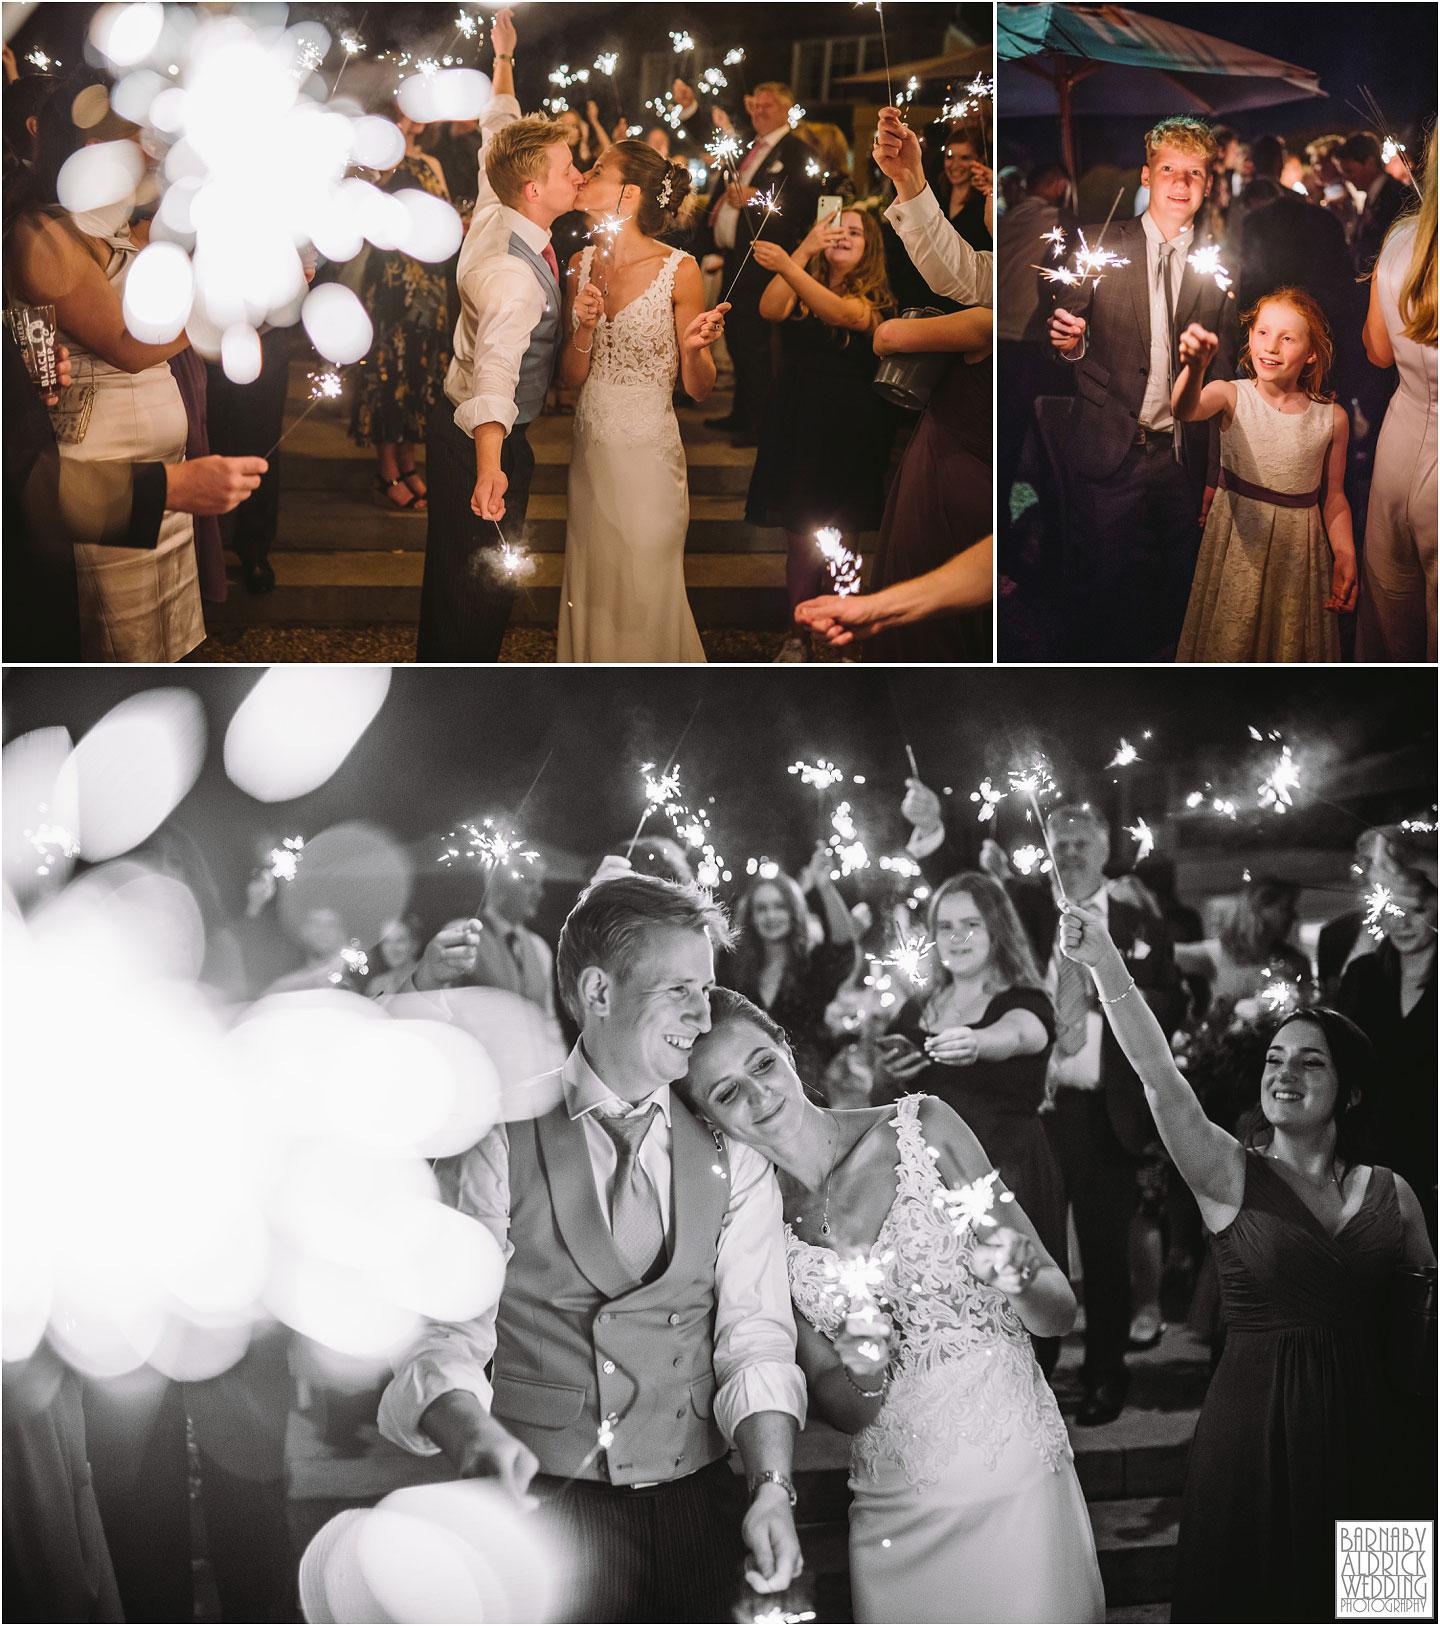 Sparklers wedding photos at Goldsbrough Hall